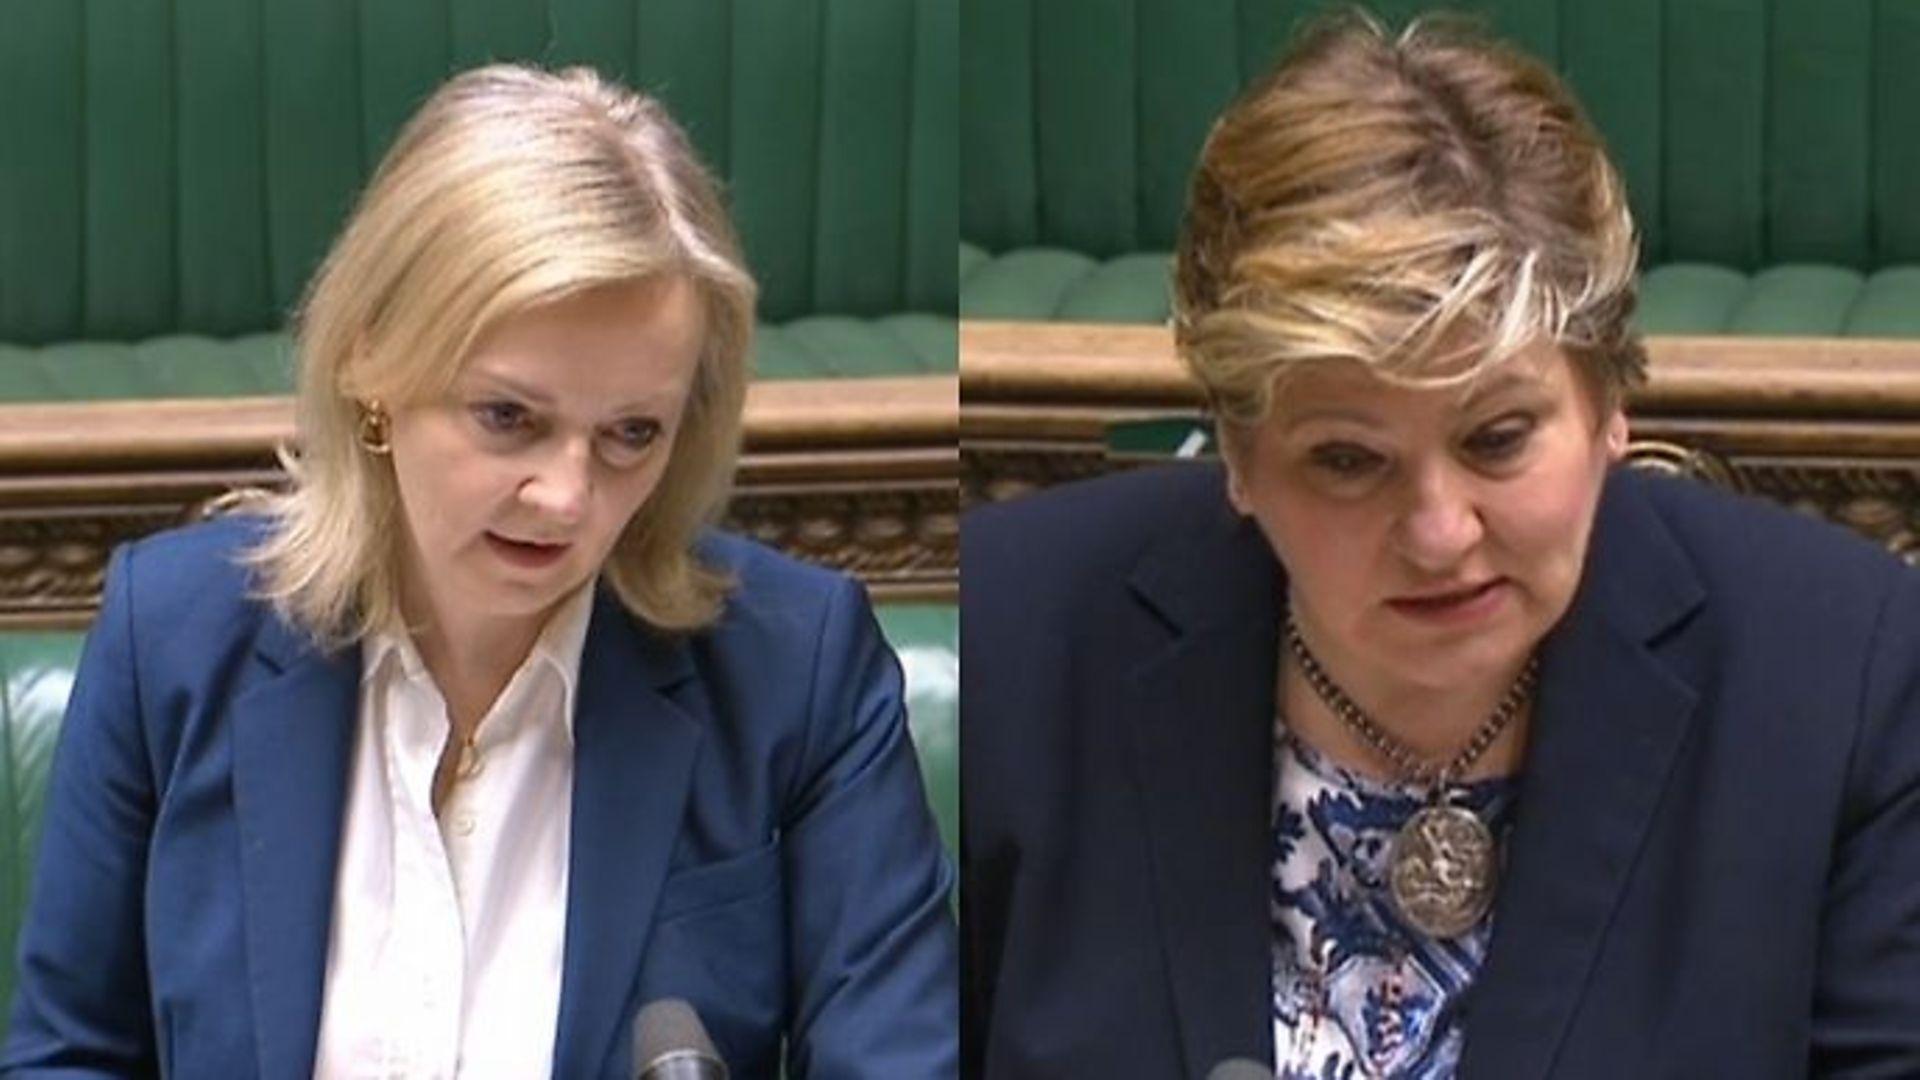 Liz Truss and Emily Thornberry debate Brexit deals - Credit: Parliament Live